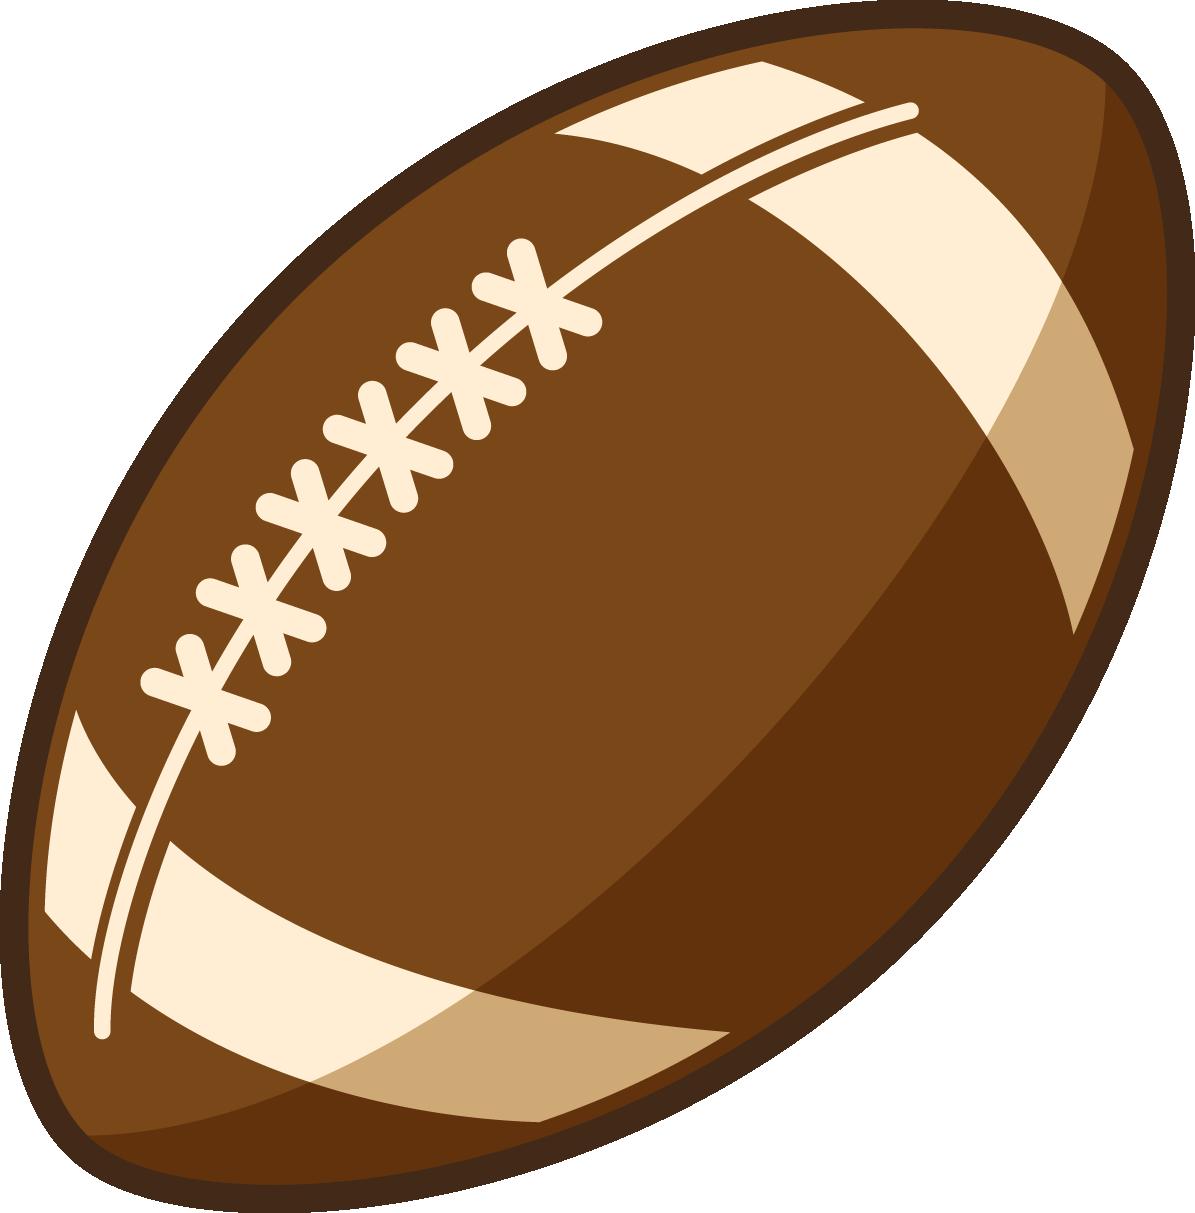 1195x1213 Free American Football Clip Art